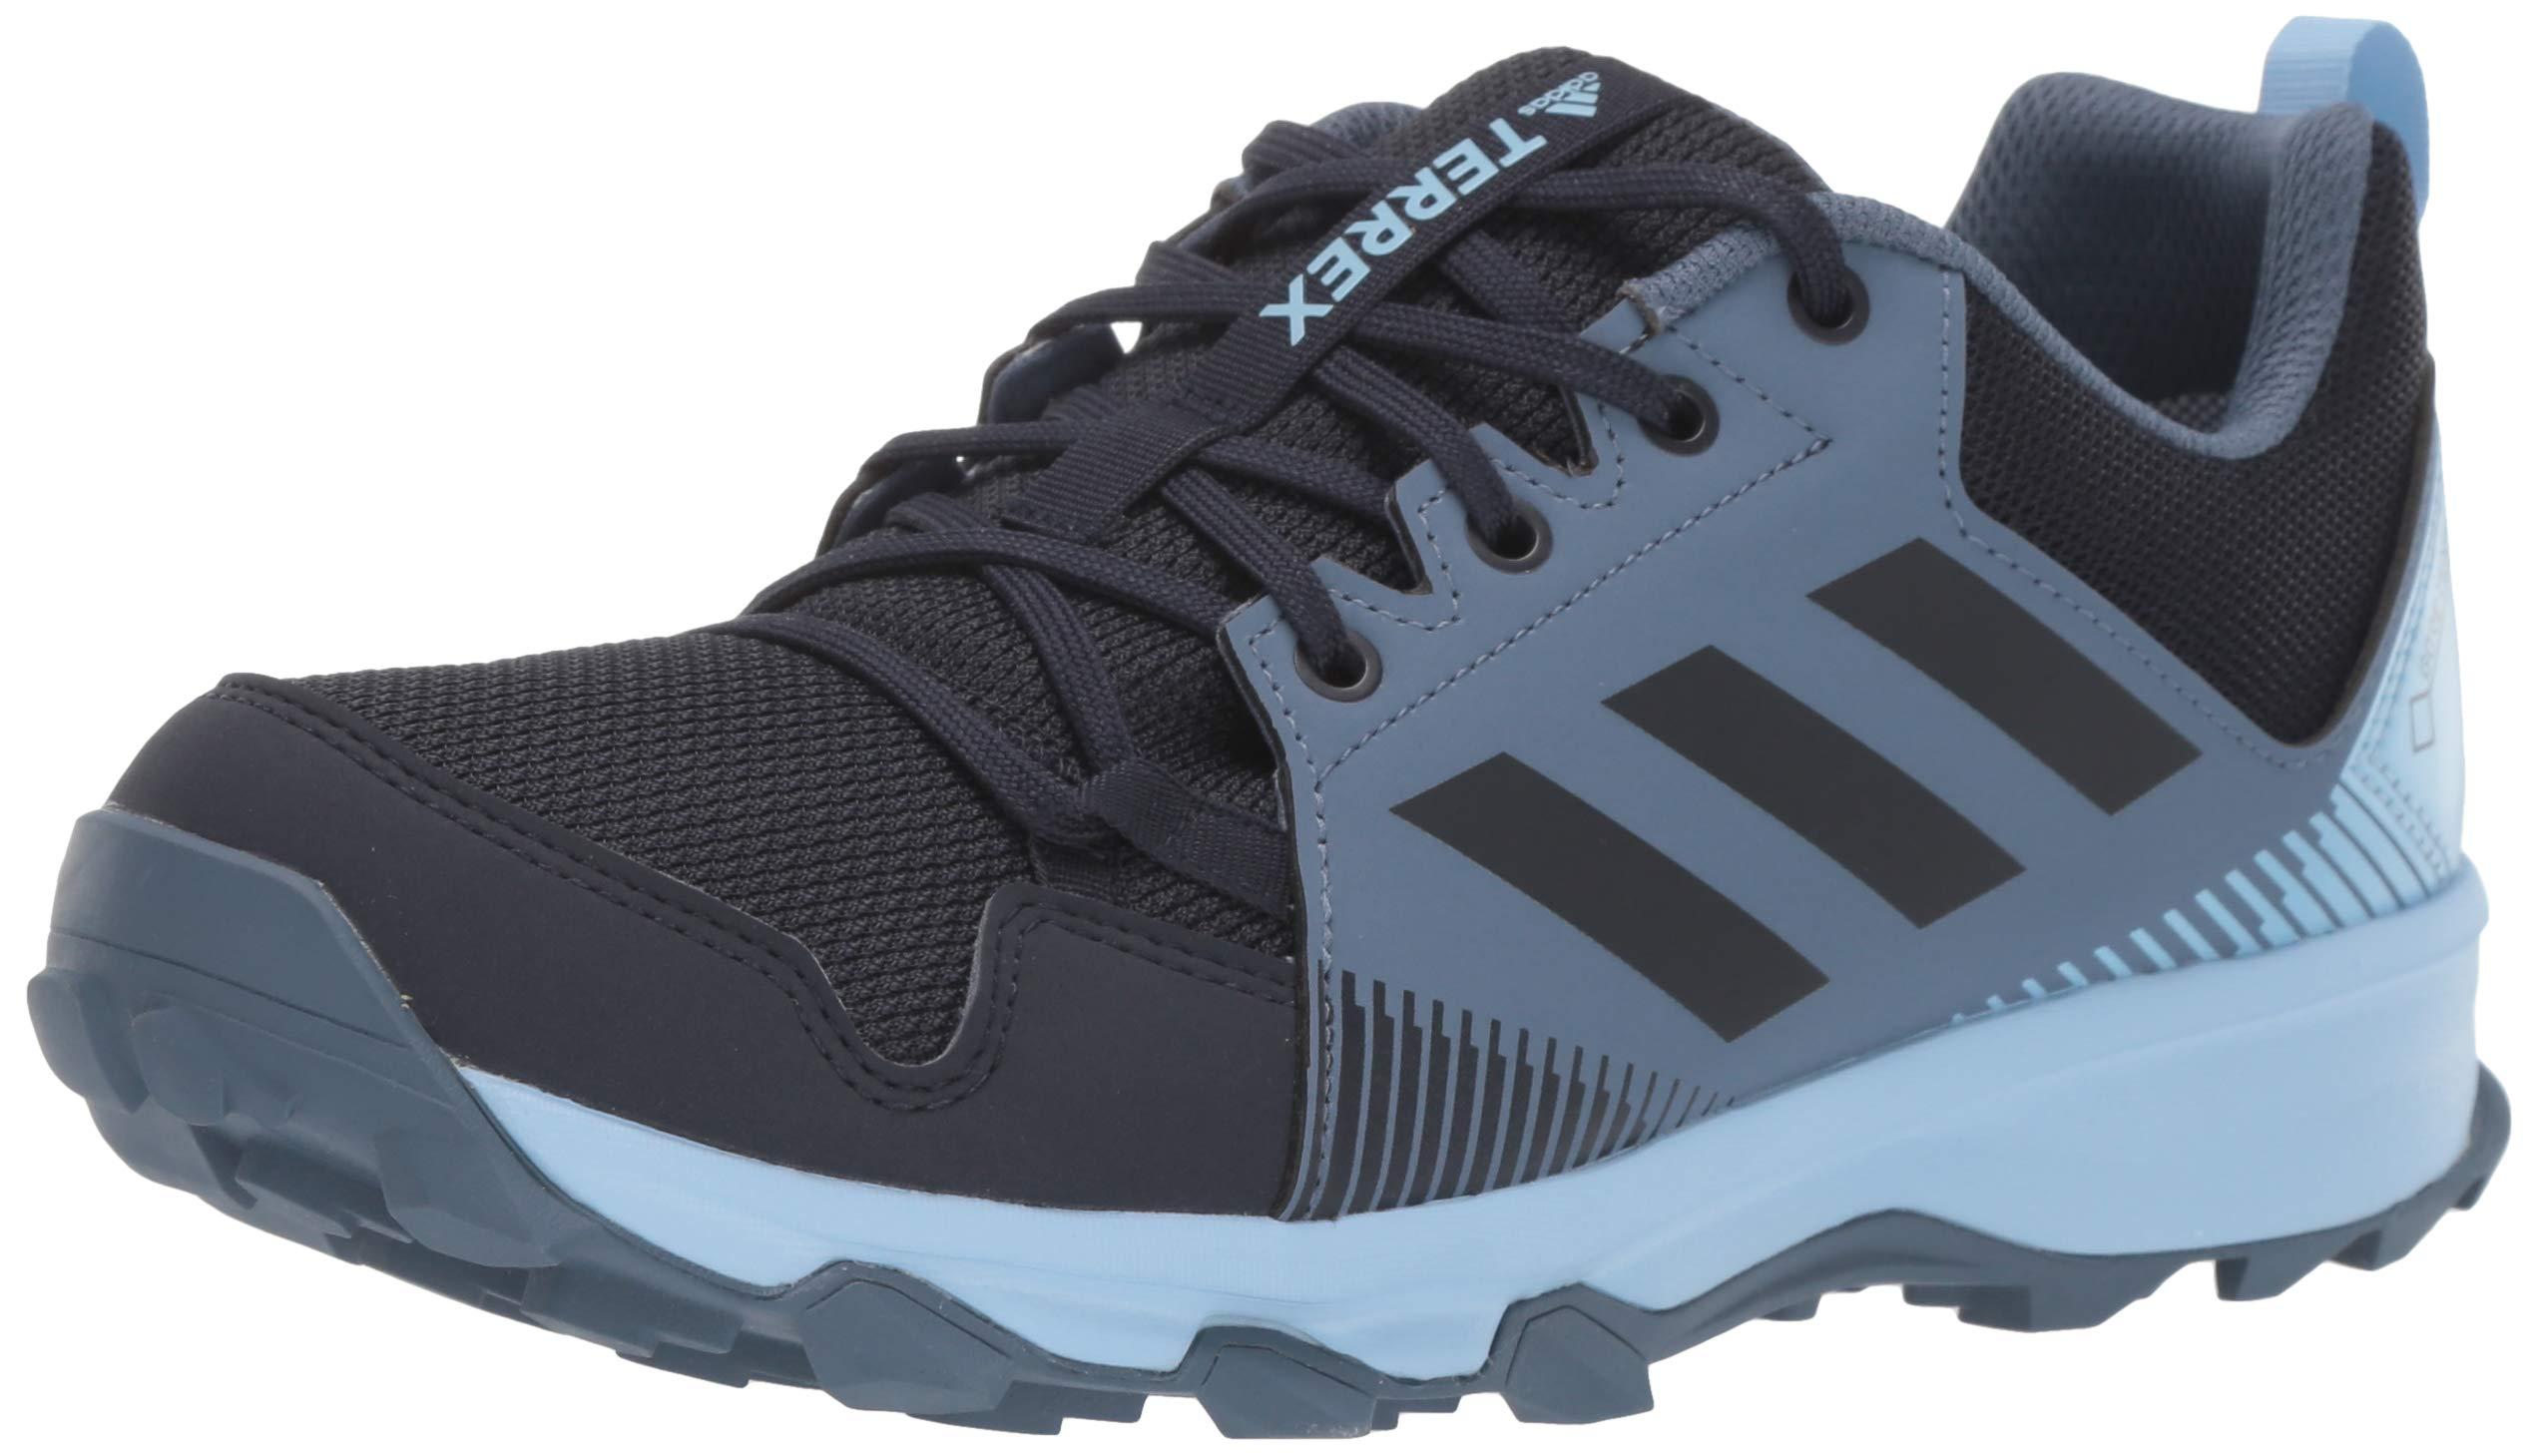 adidas outdoor Women's Terrex Tracerocker GTX Trail Running Shoe, Legend Ink/Glow Blue, 9 M US by adidas outdoor